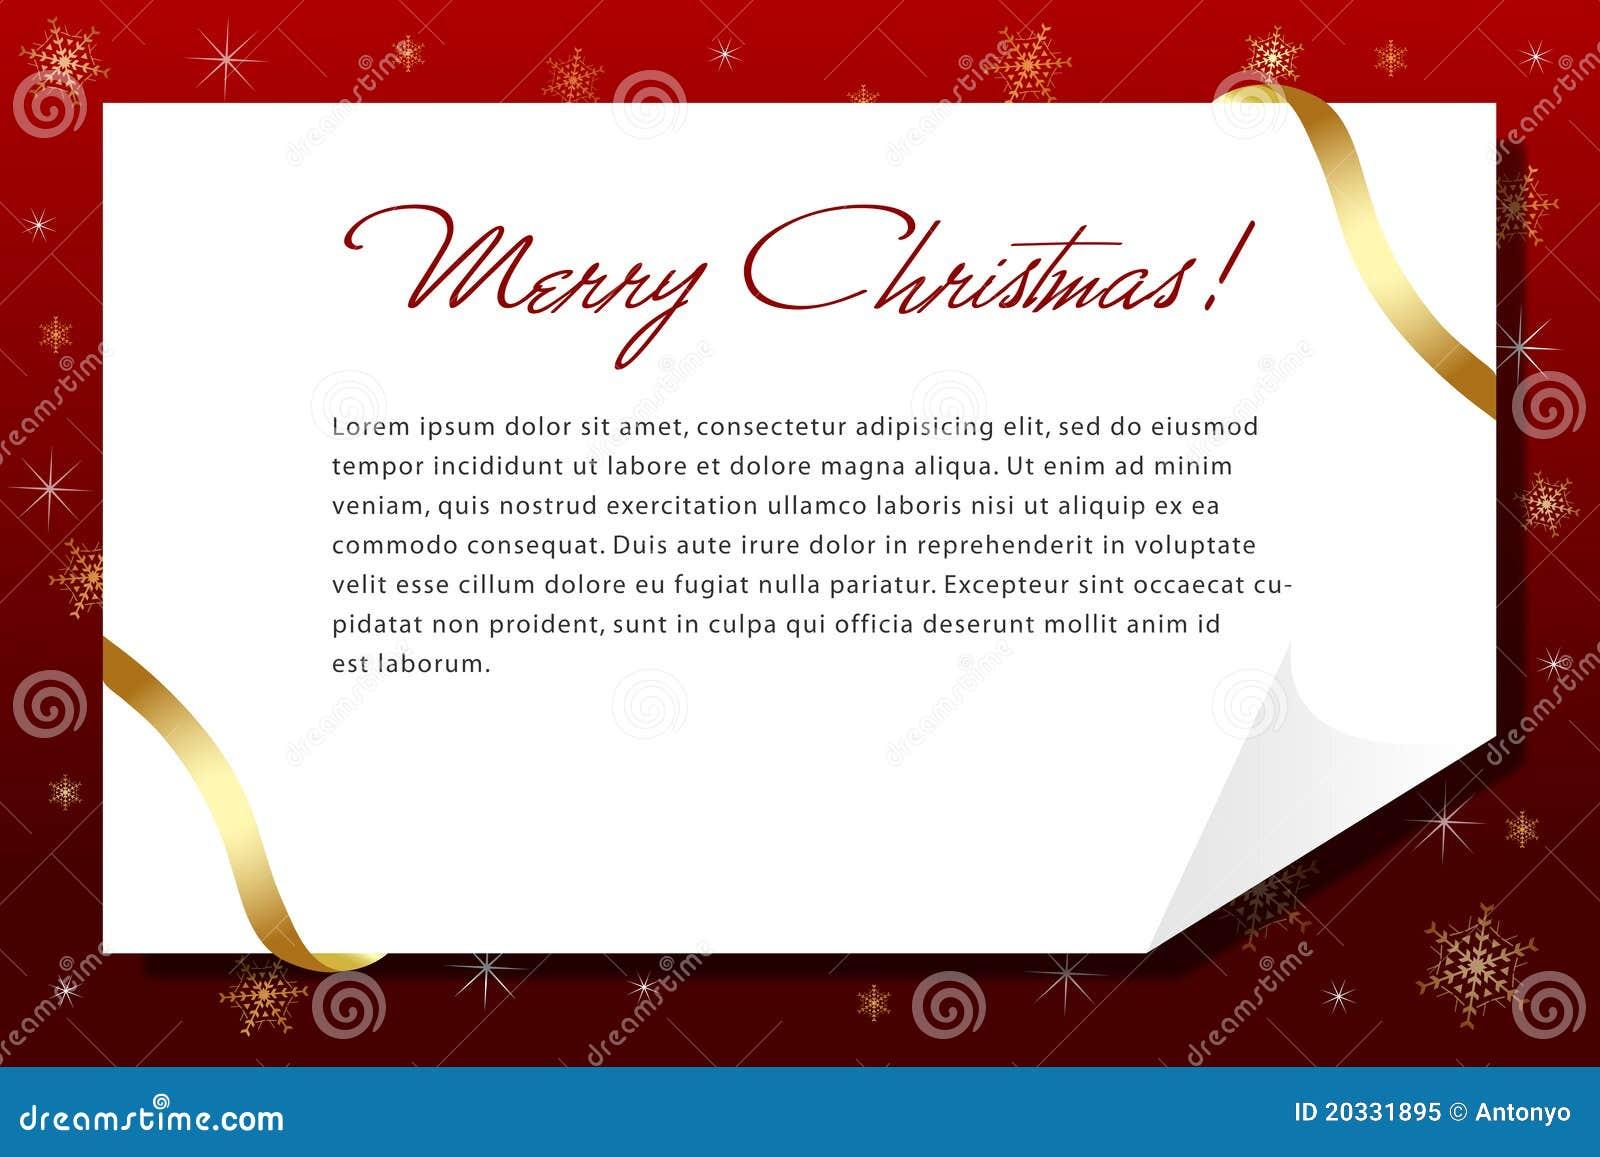 Una carta de la Navidad